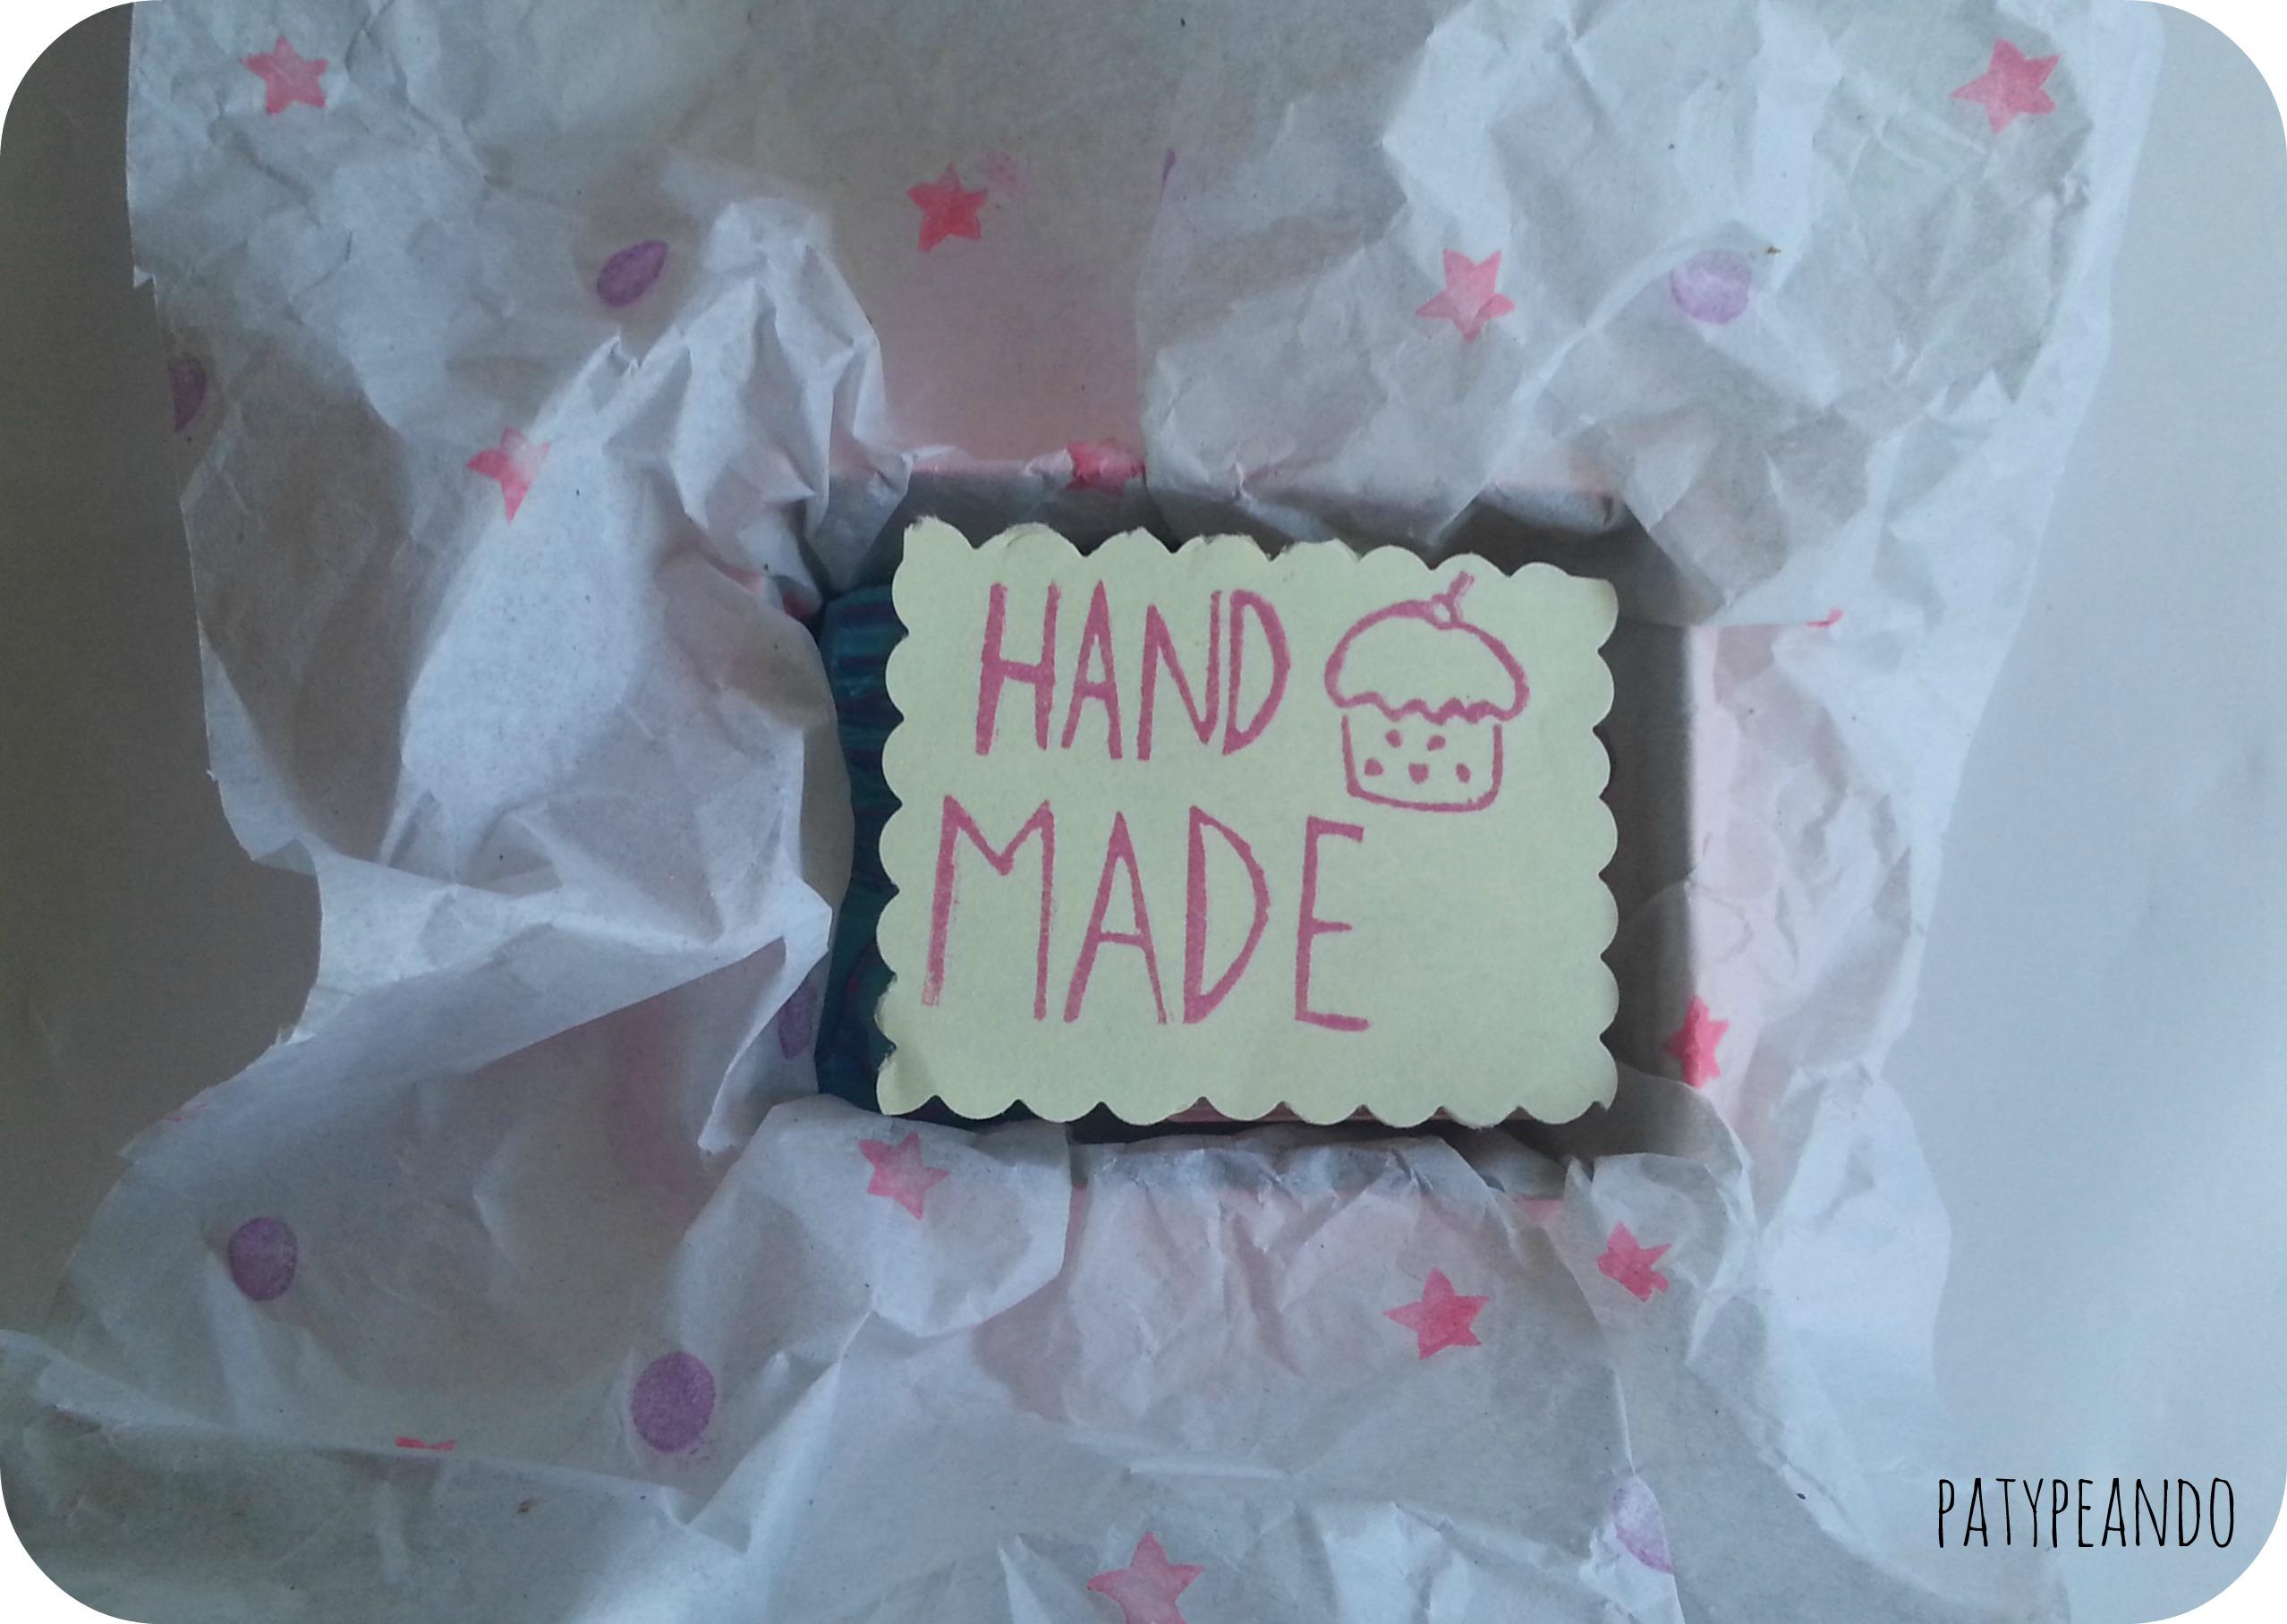 sello hand made 3